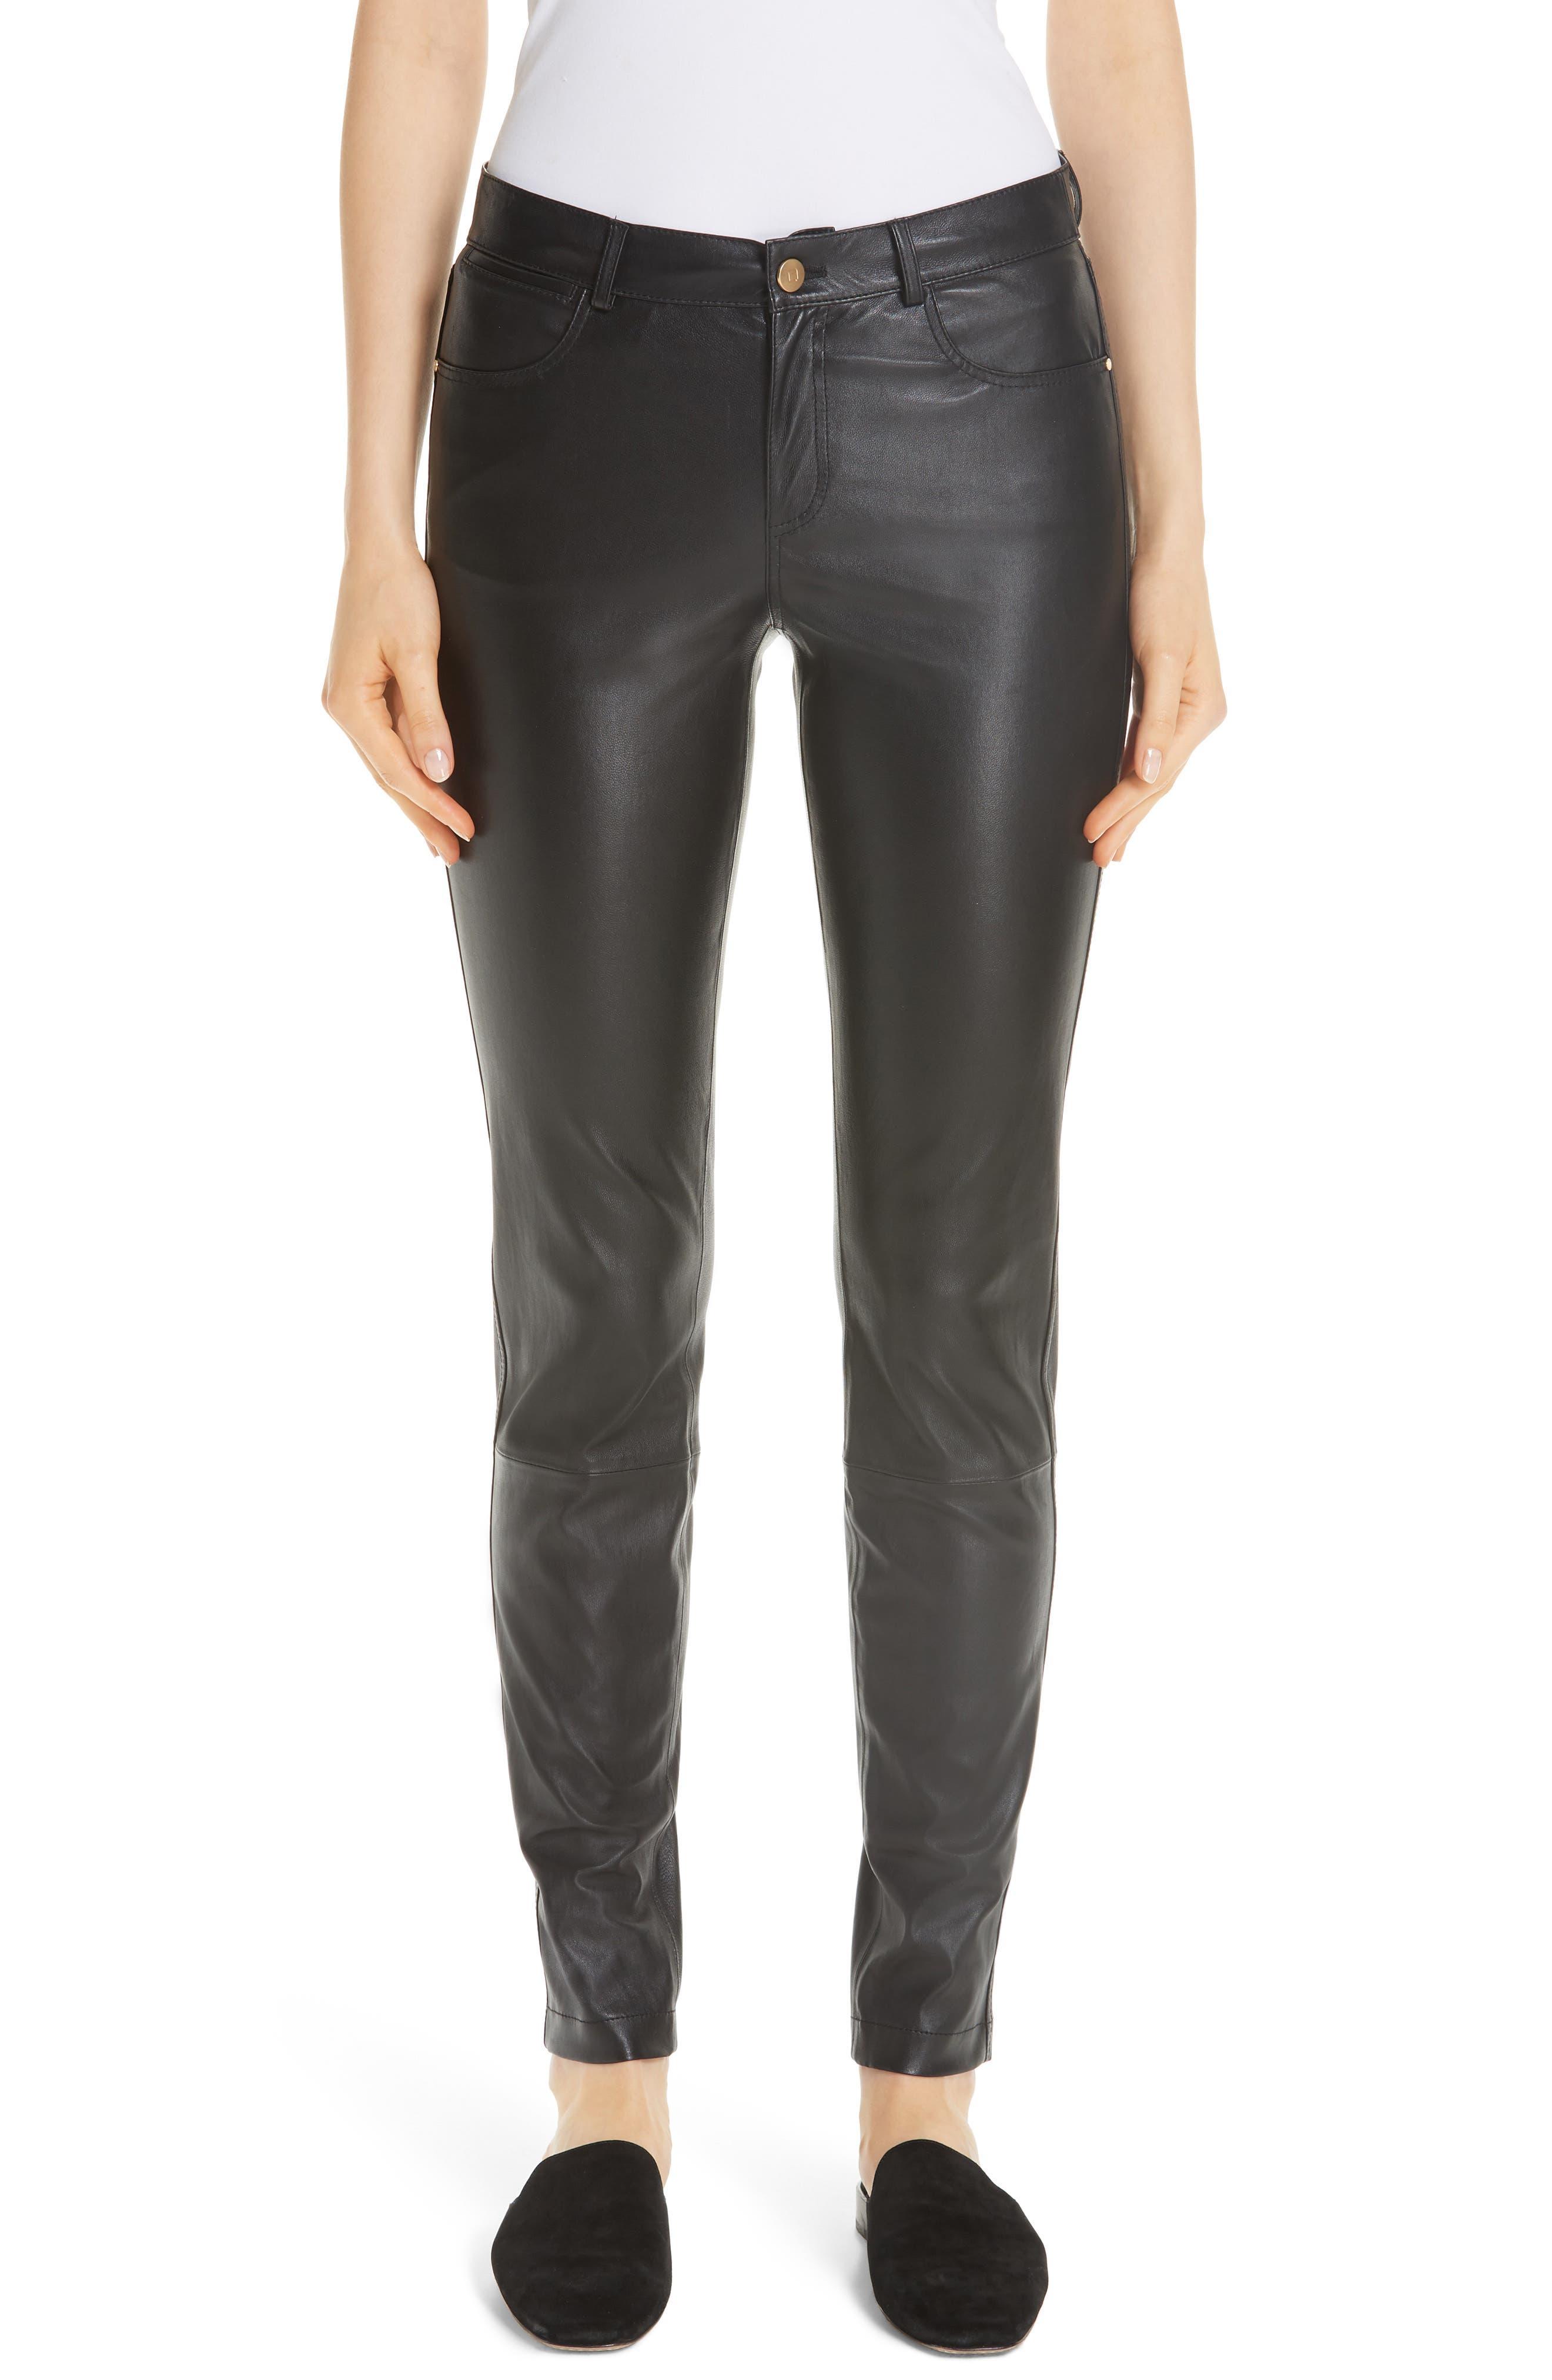 Mercer Nappa Leather Pants,                         Main,                         color, BLACK